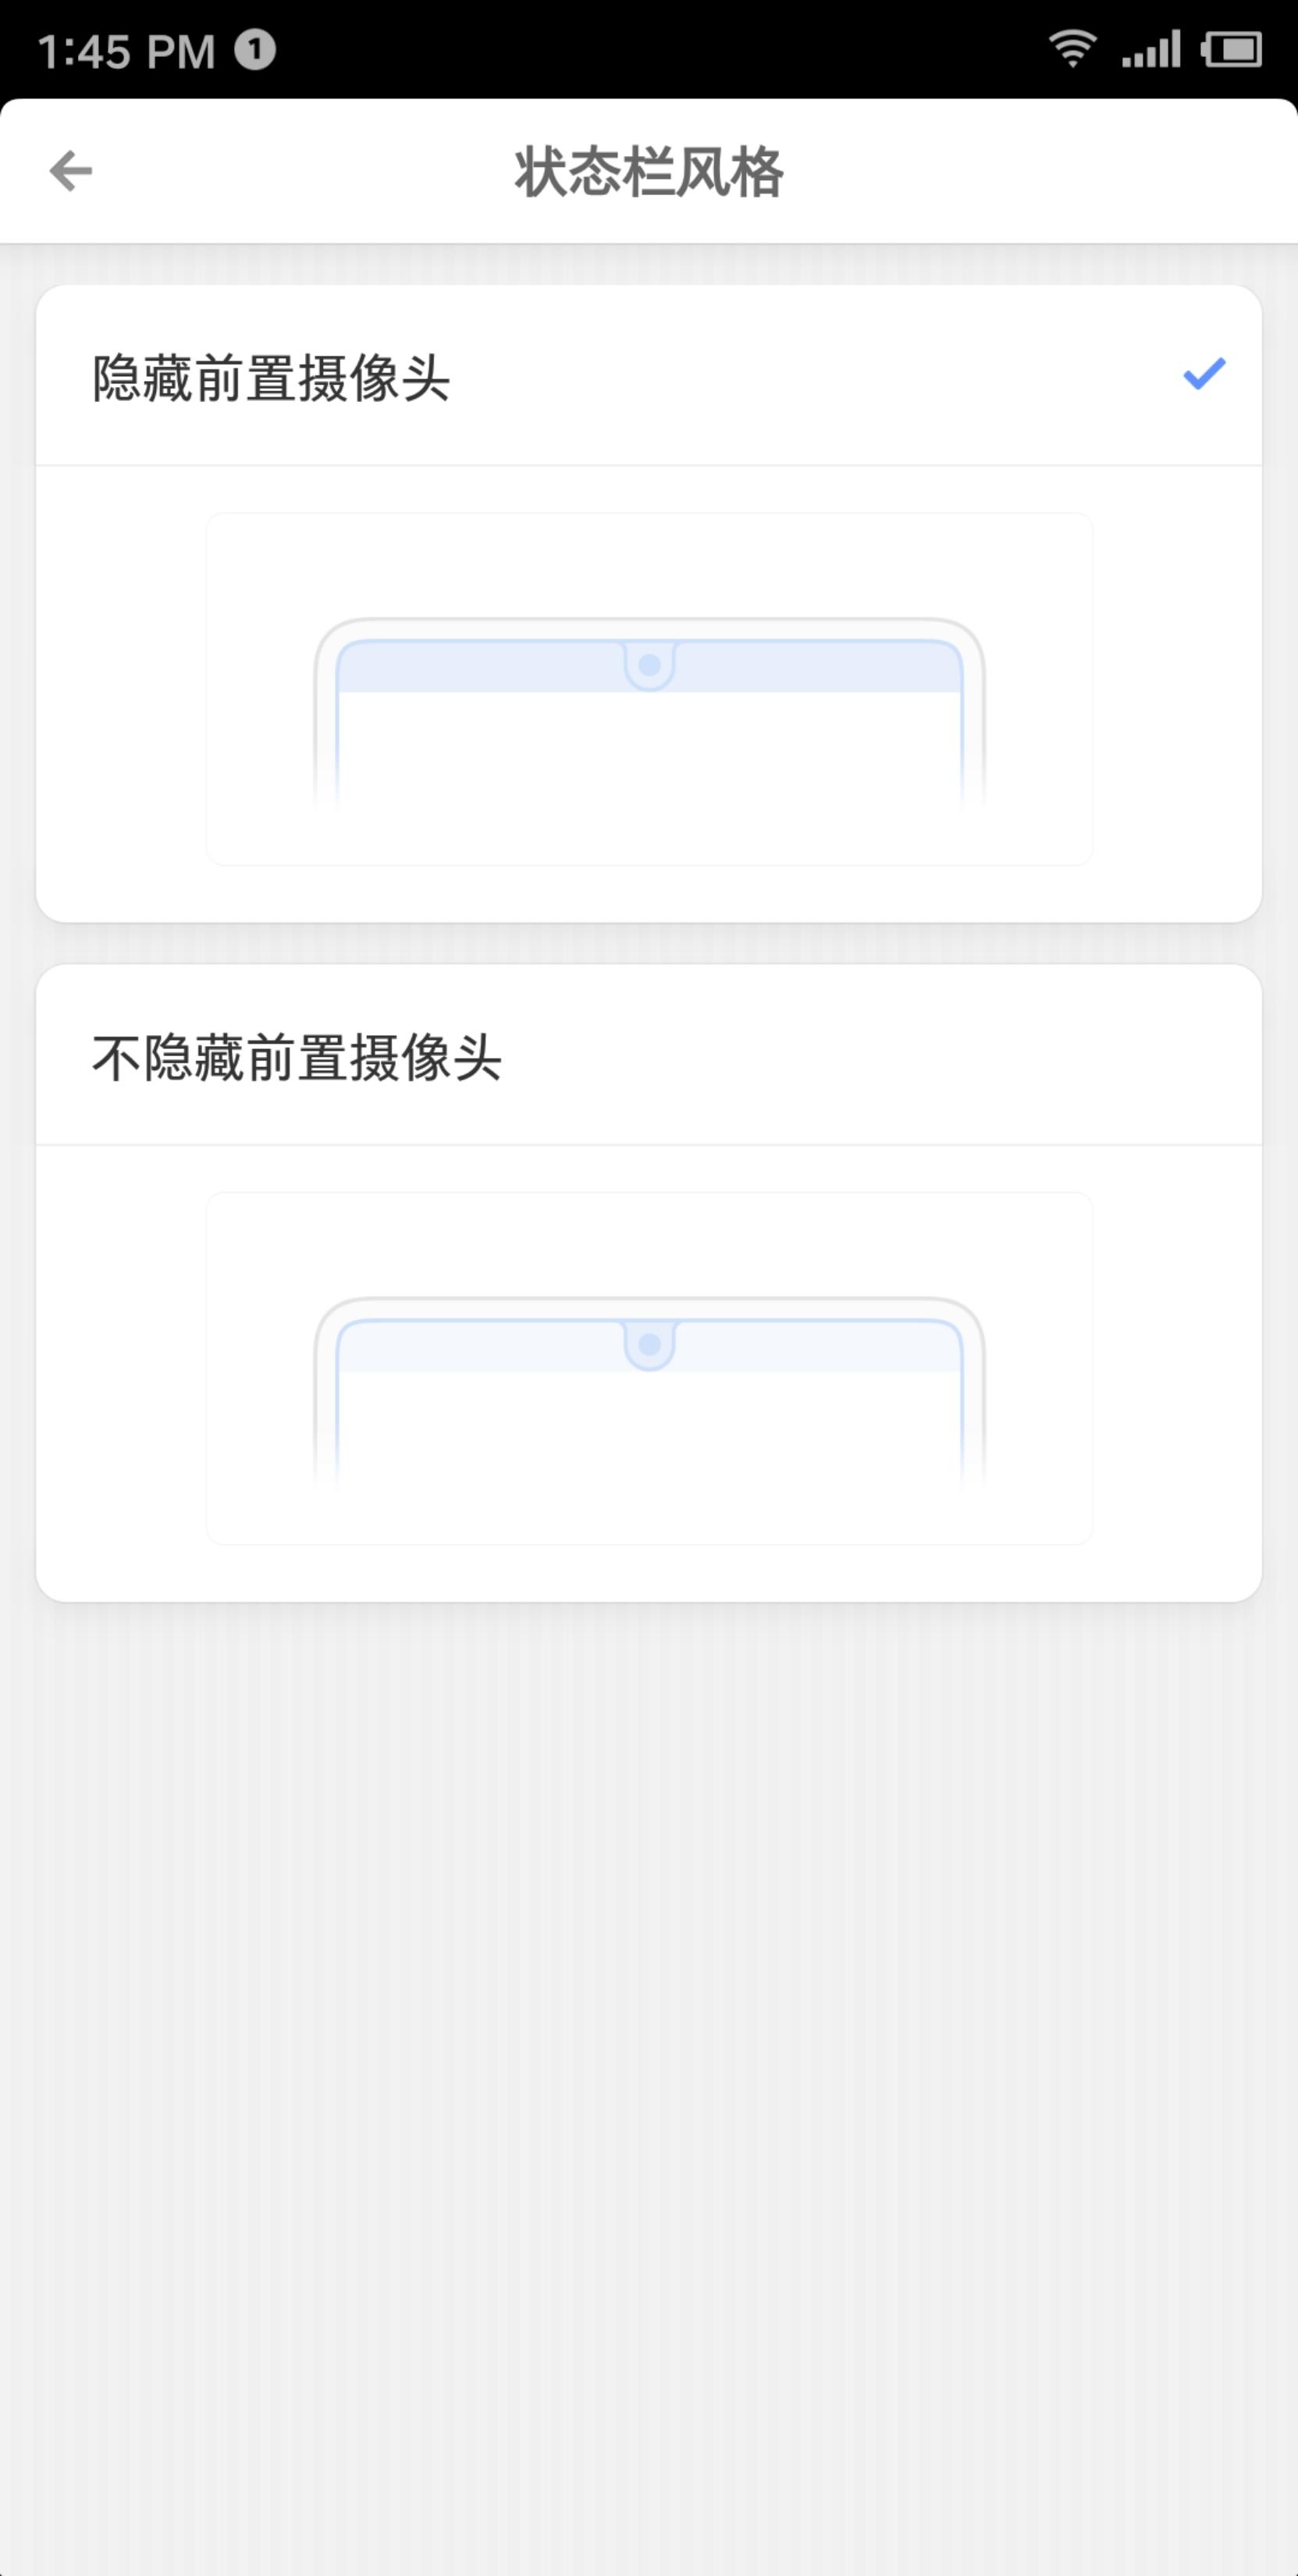 Screenshot_2020-04-02-13-45-41-016_??.png